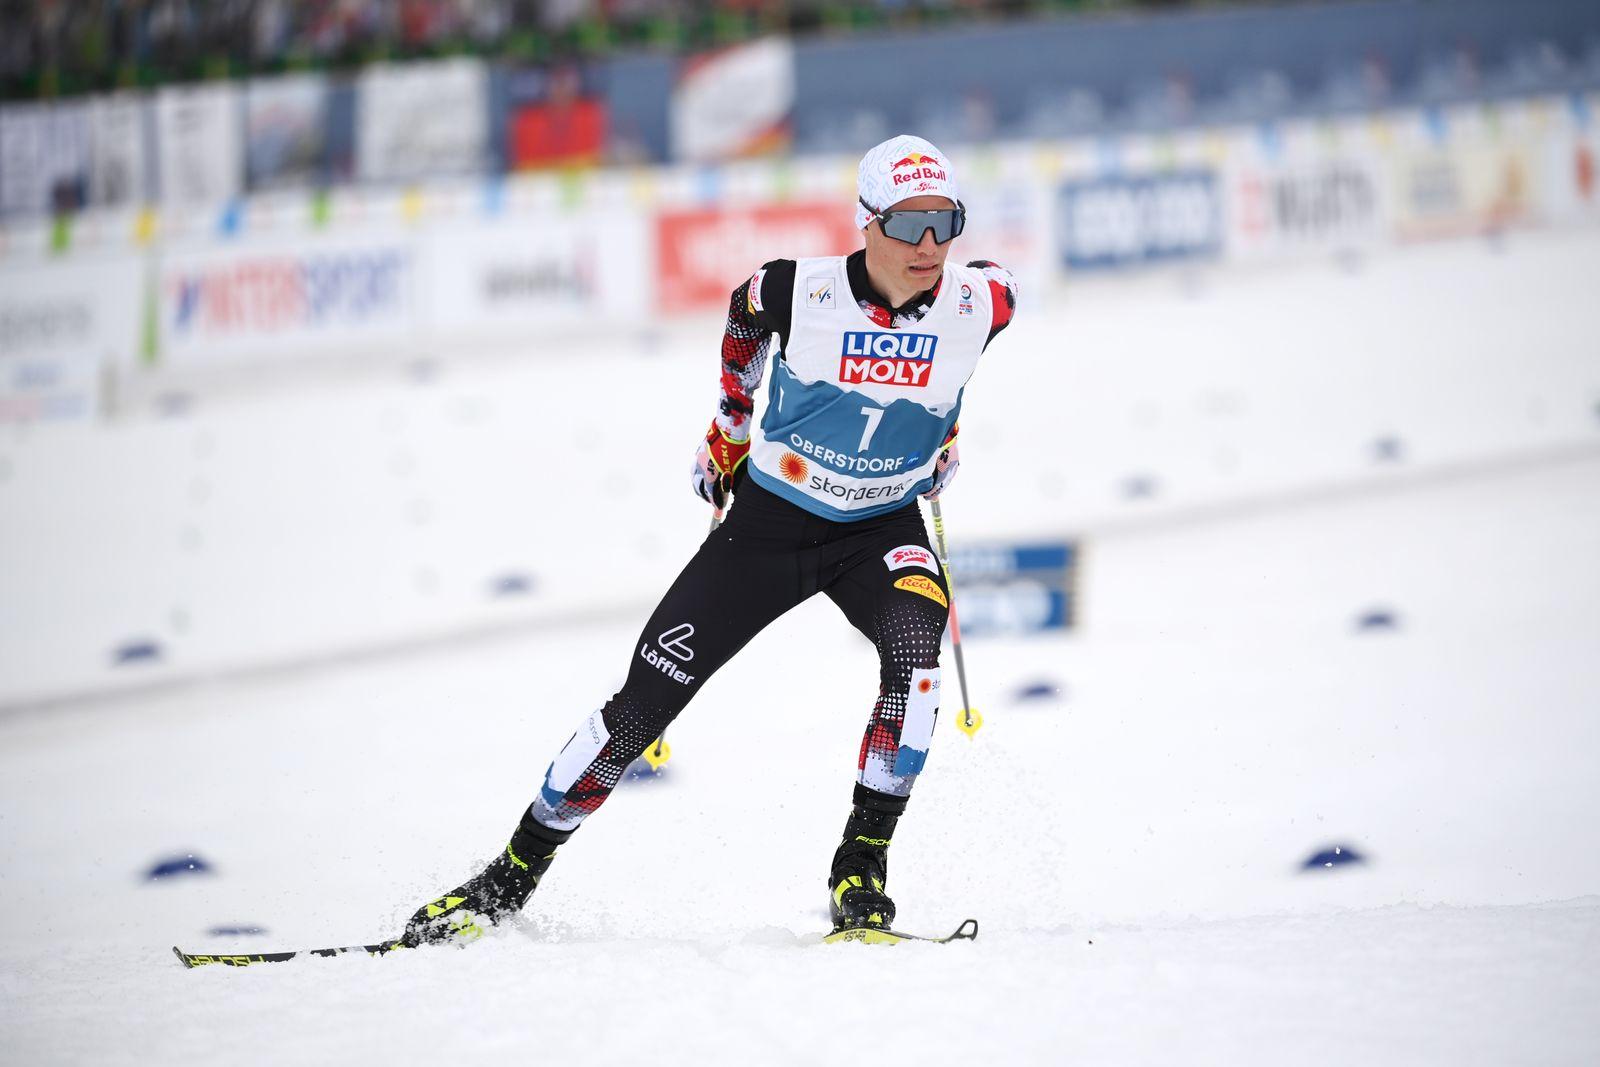 FIS Nordic World Ski Championships Oberstdorf - Men's Nordic Combined Gundersen Large Hill HS137/10.0 Km